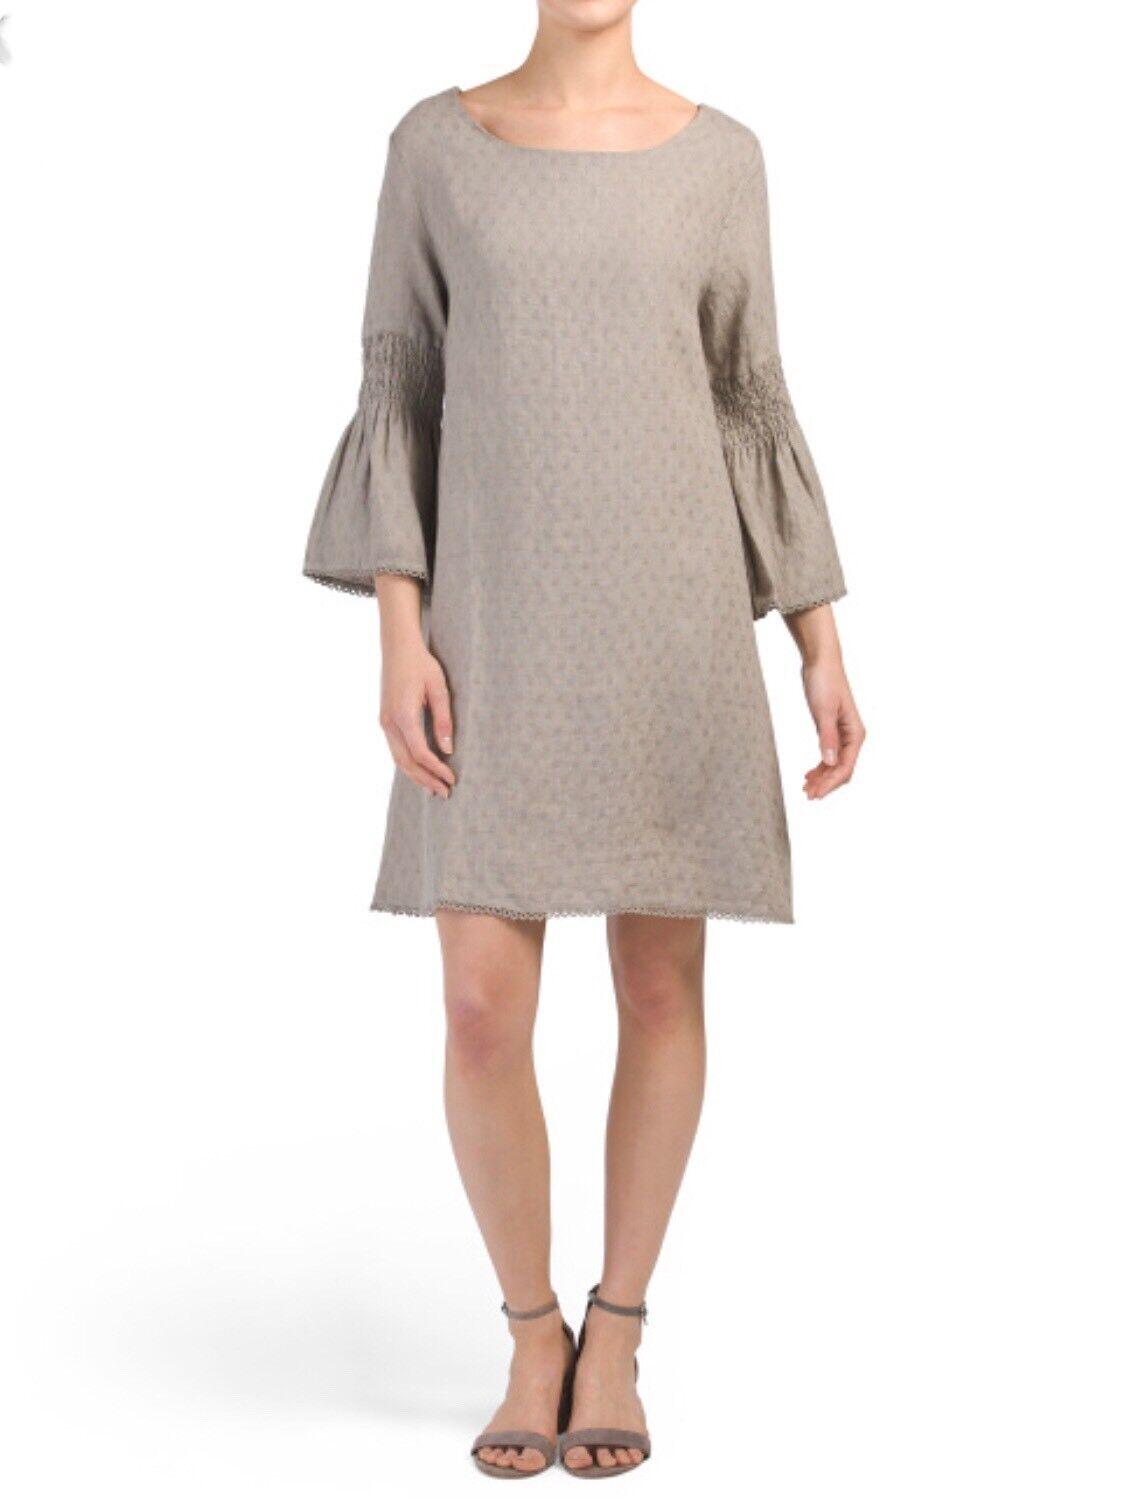 NEW Lungo L'arno Italian Linen Small-Medium Women Dress Bell Sleeves Ivory